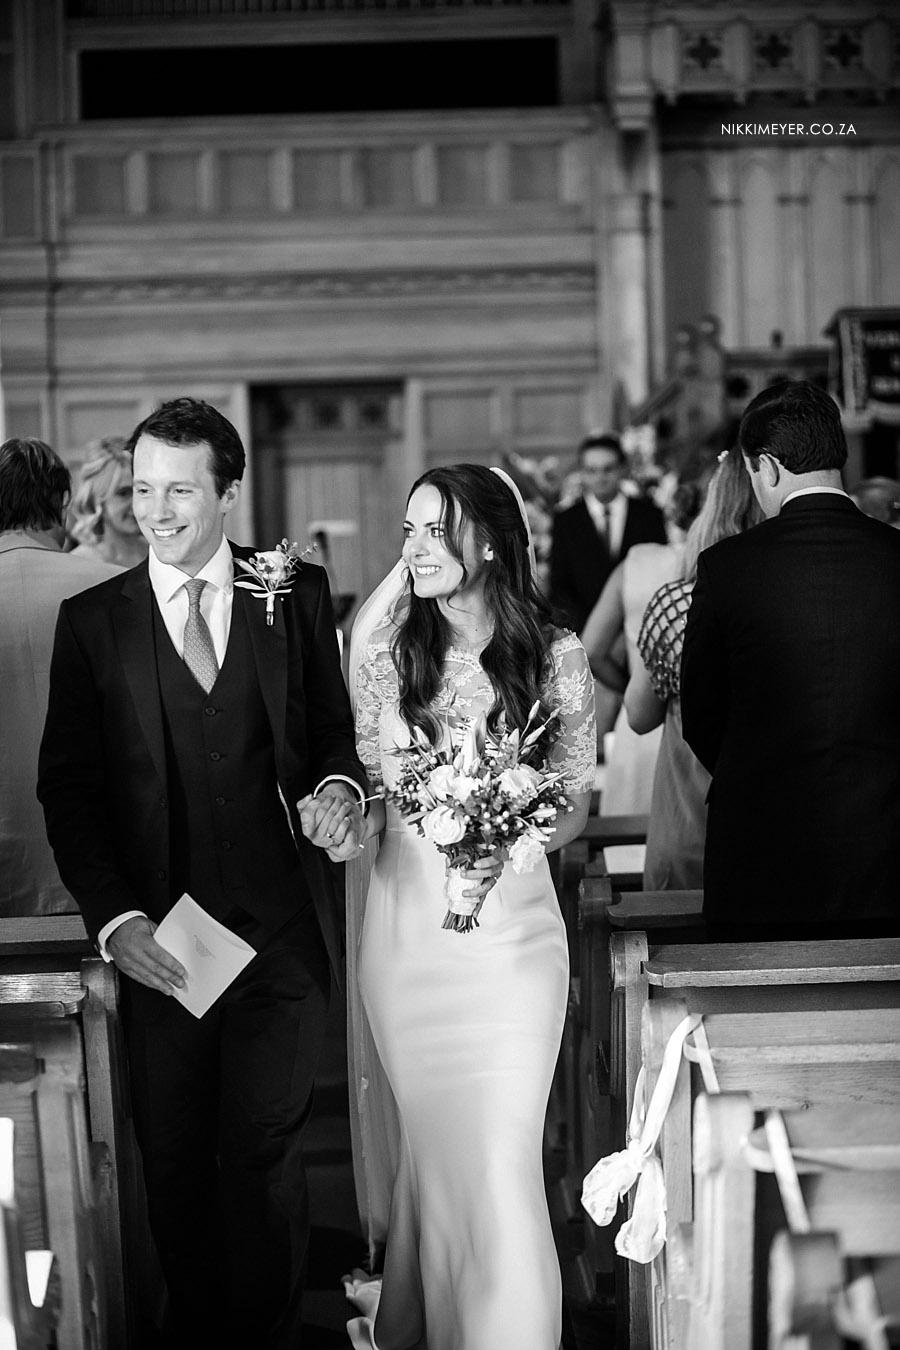 Nikki-Meyer-Wedding-Photographer-La-Petite-Dauphine-Franschhoek-Wedding_028